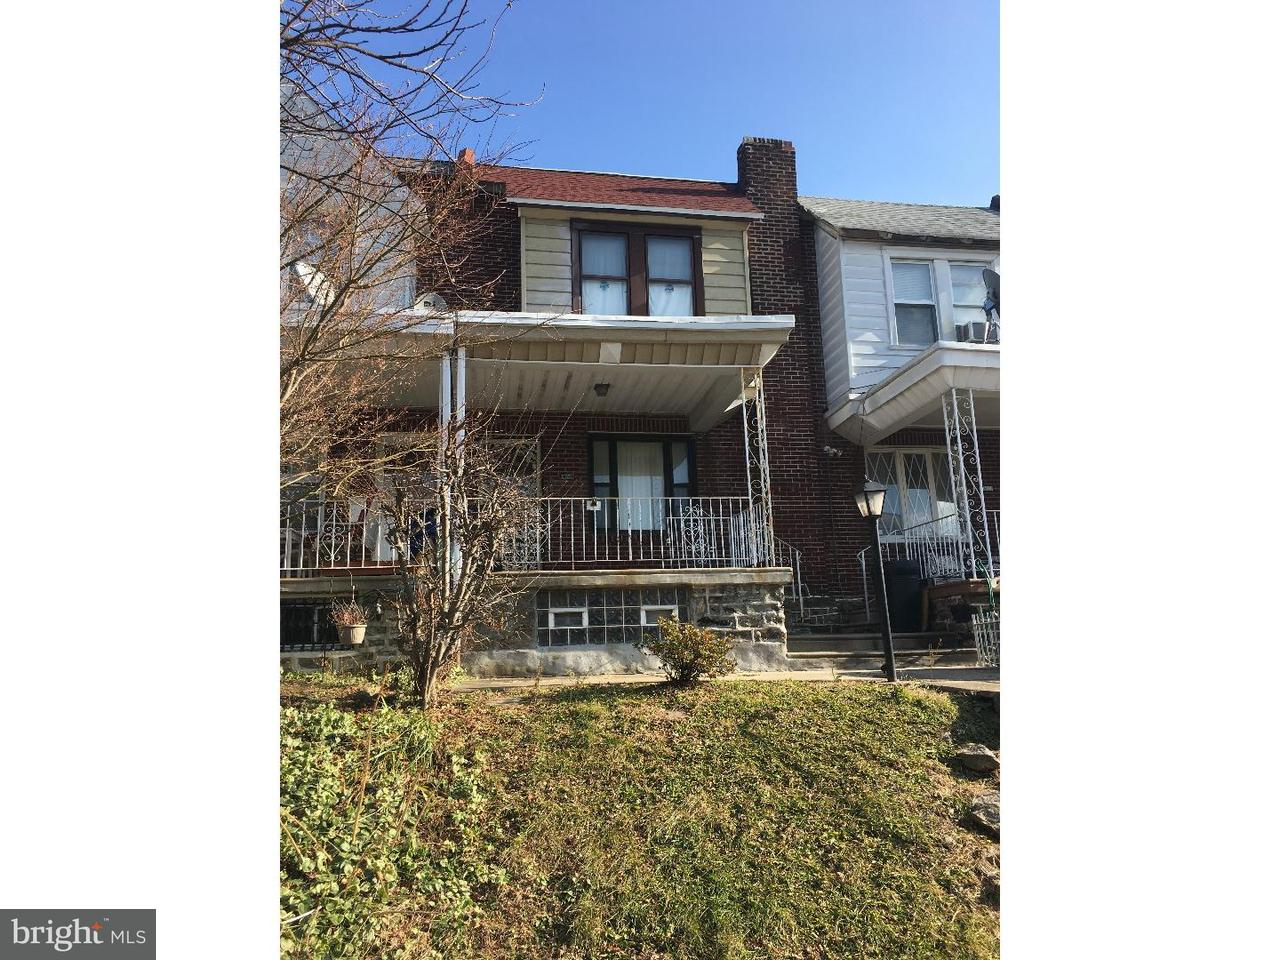 6721 N Bouvier Philadelphia , PA 19126